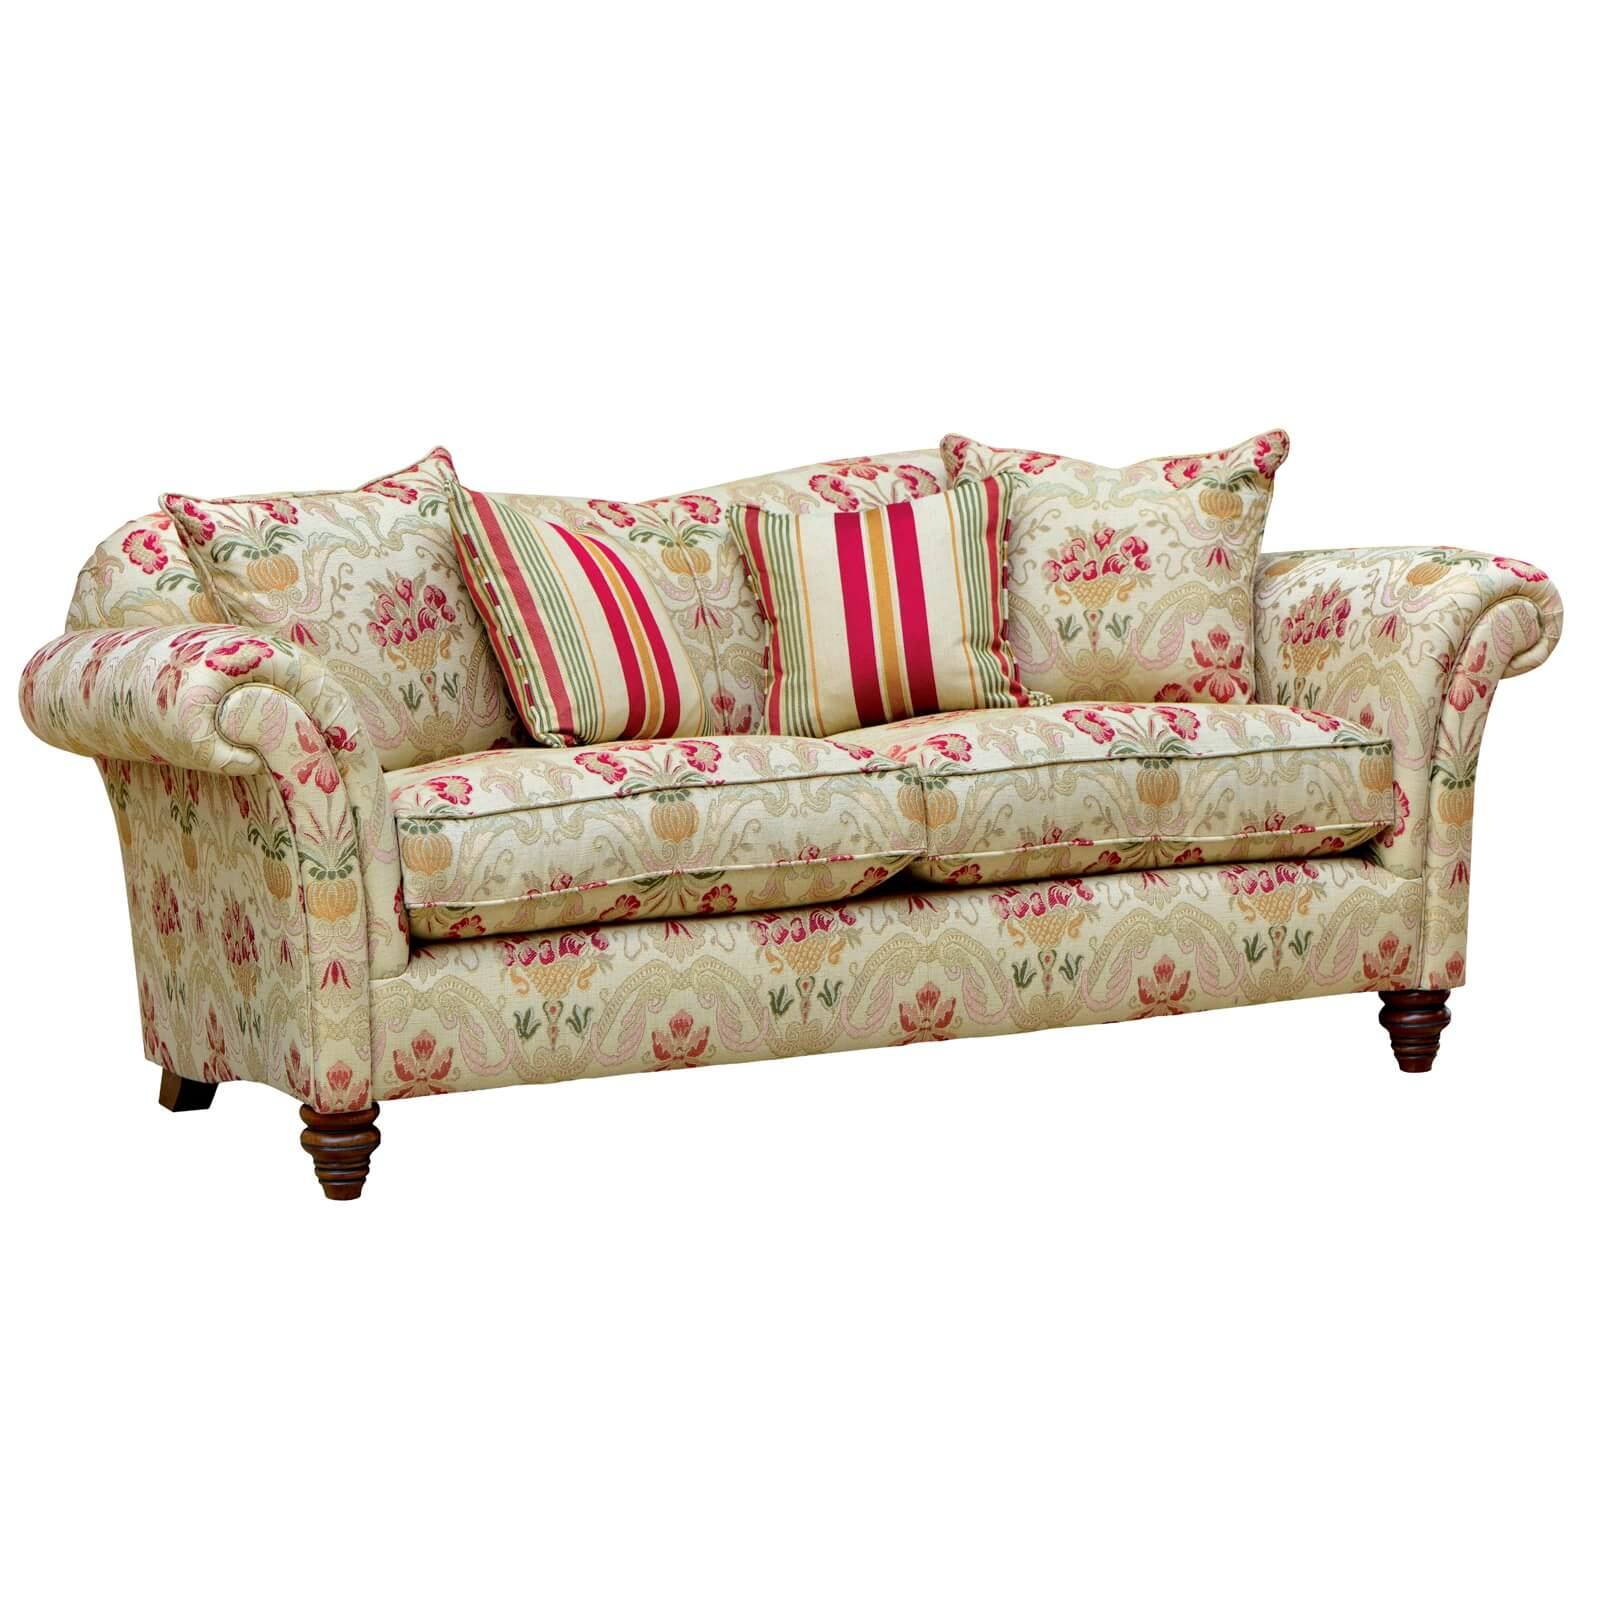 3 sitzer juliette ph nix sch ner leben. Black Bedroom Furniture Sets. Home Design Ideas